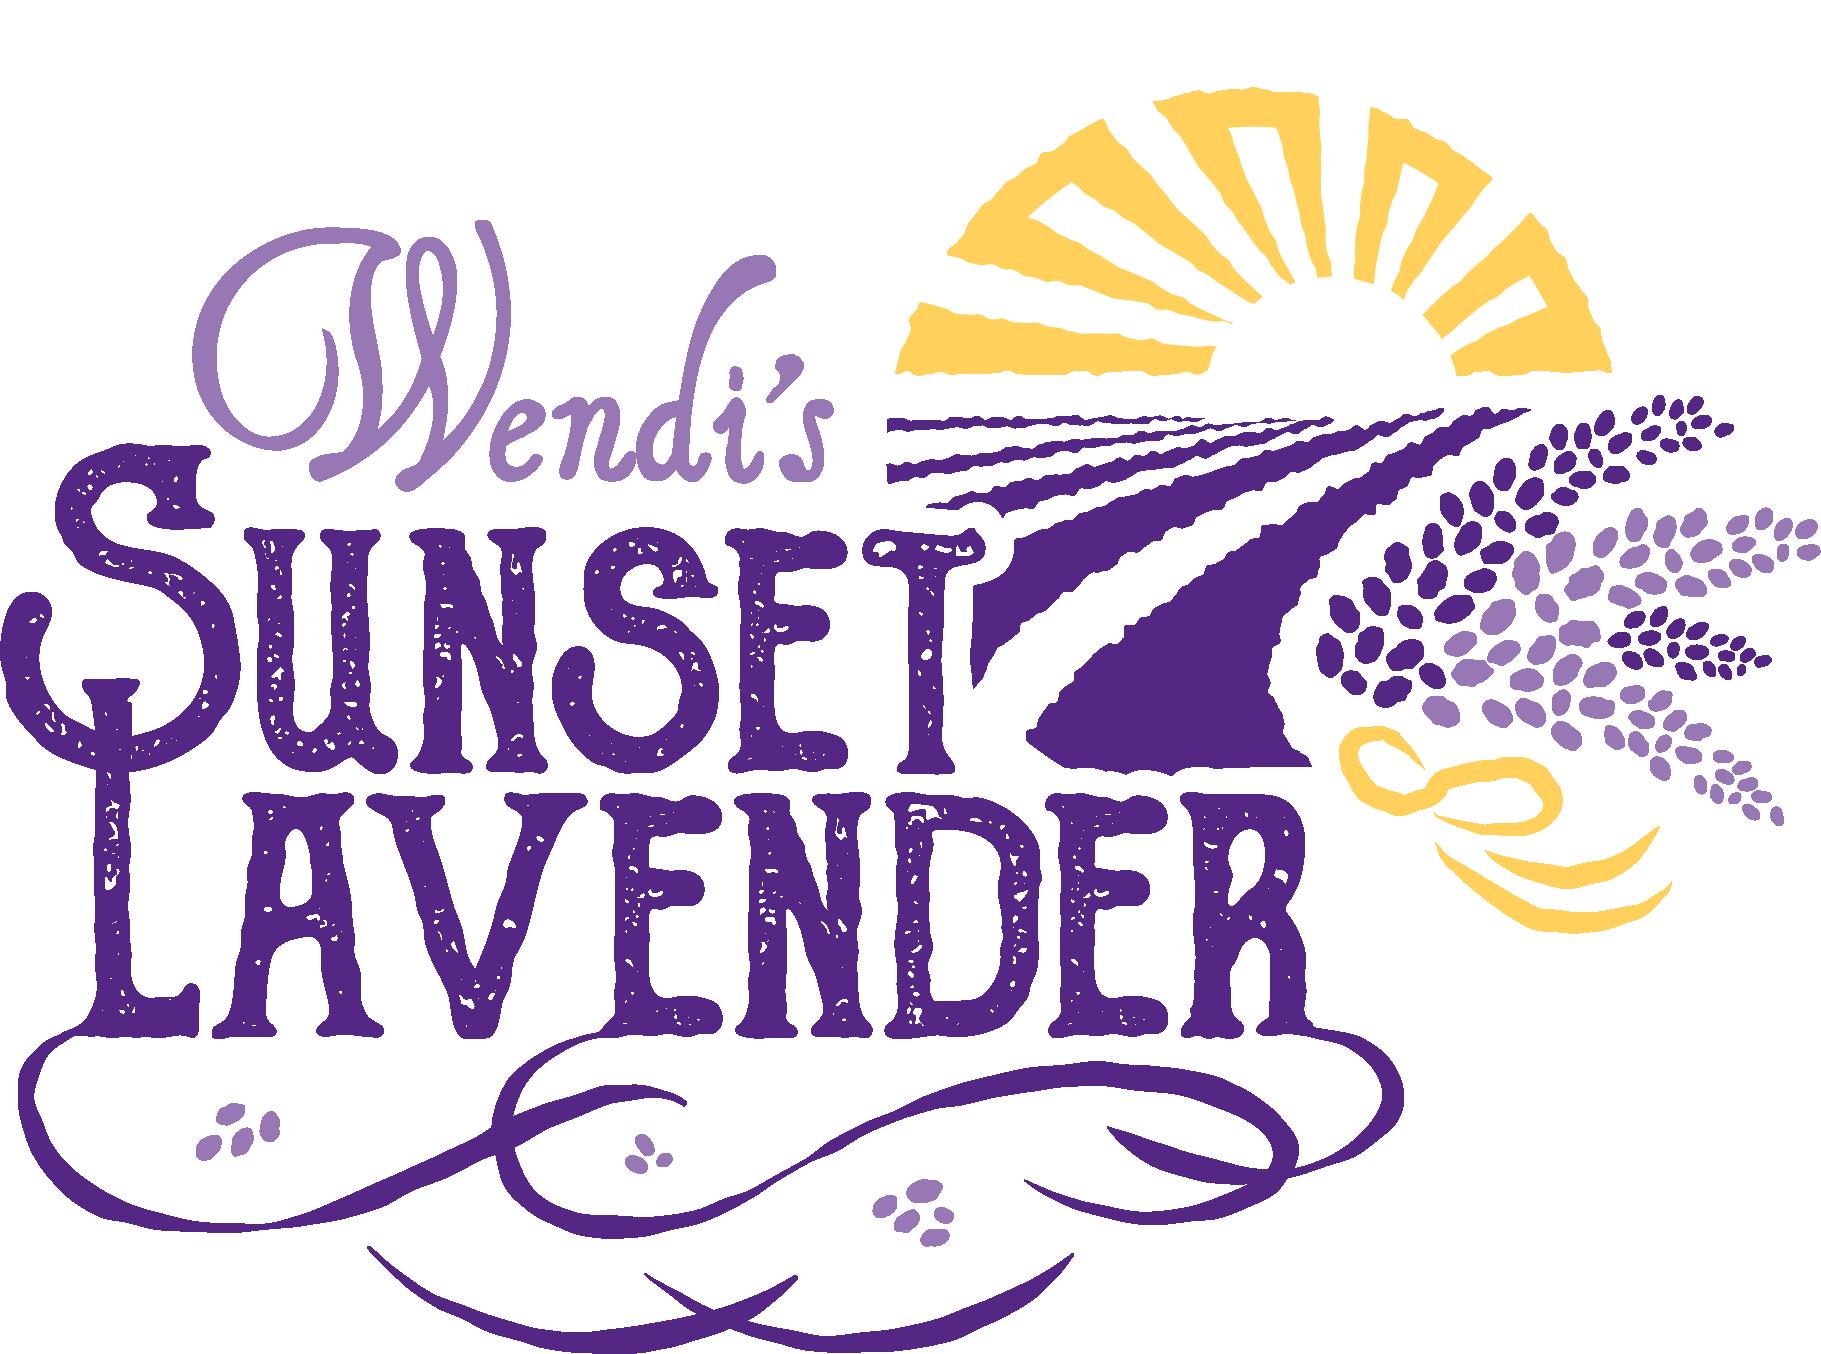 Wendi's Sunset Lavender